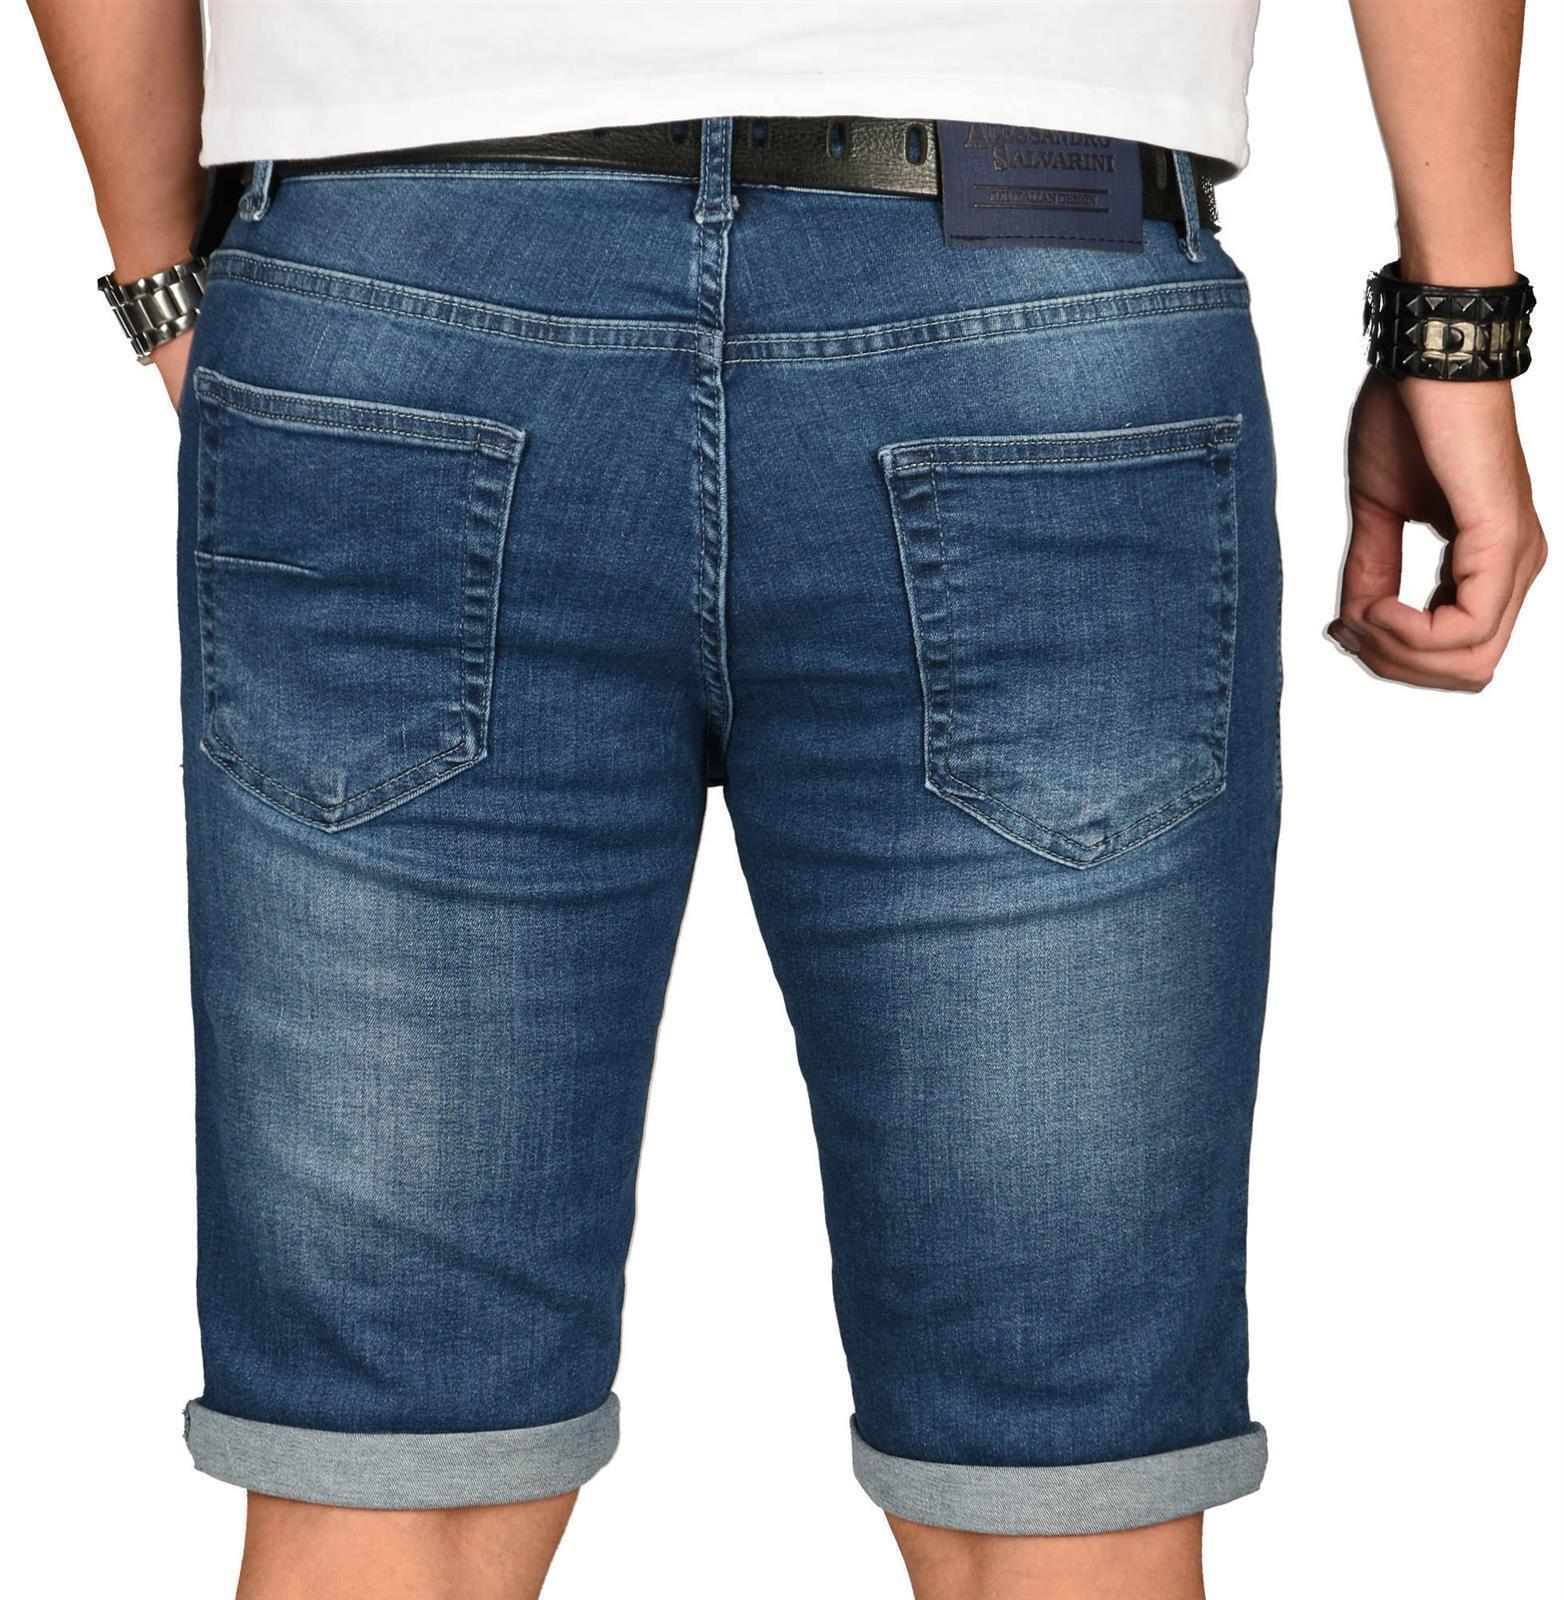 A-Salvarini-Herren-Designer-Jeans-Short-kurze-Hose-Slim-Sommer-Shorts-Washed Indexbild 33